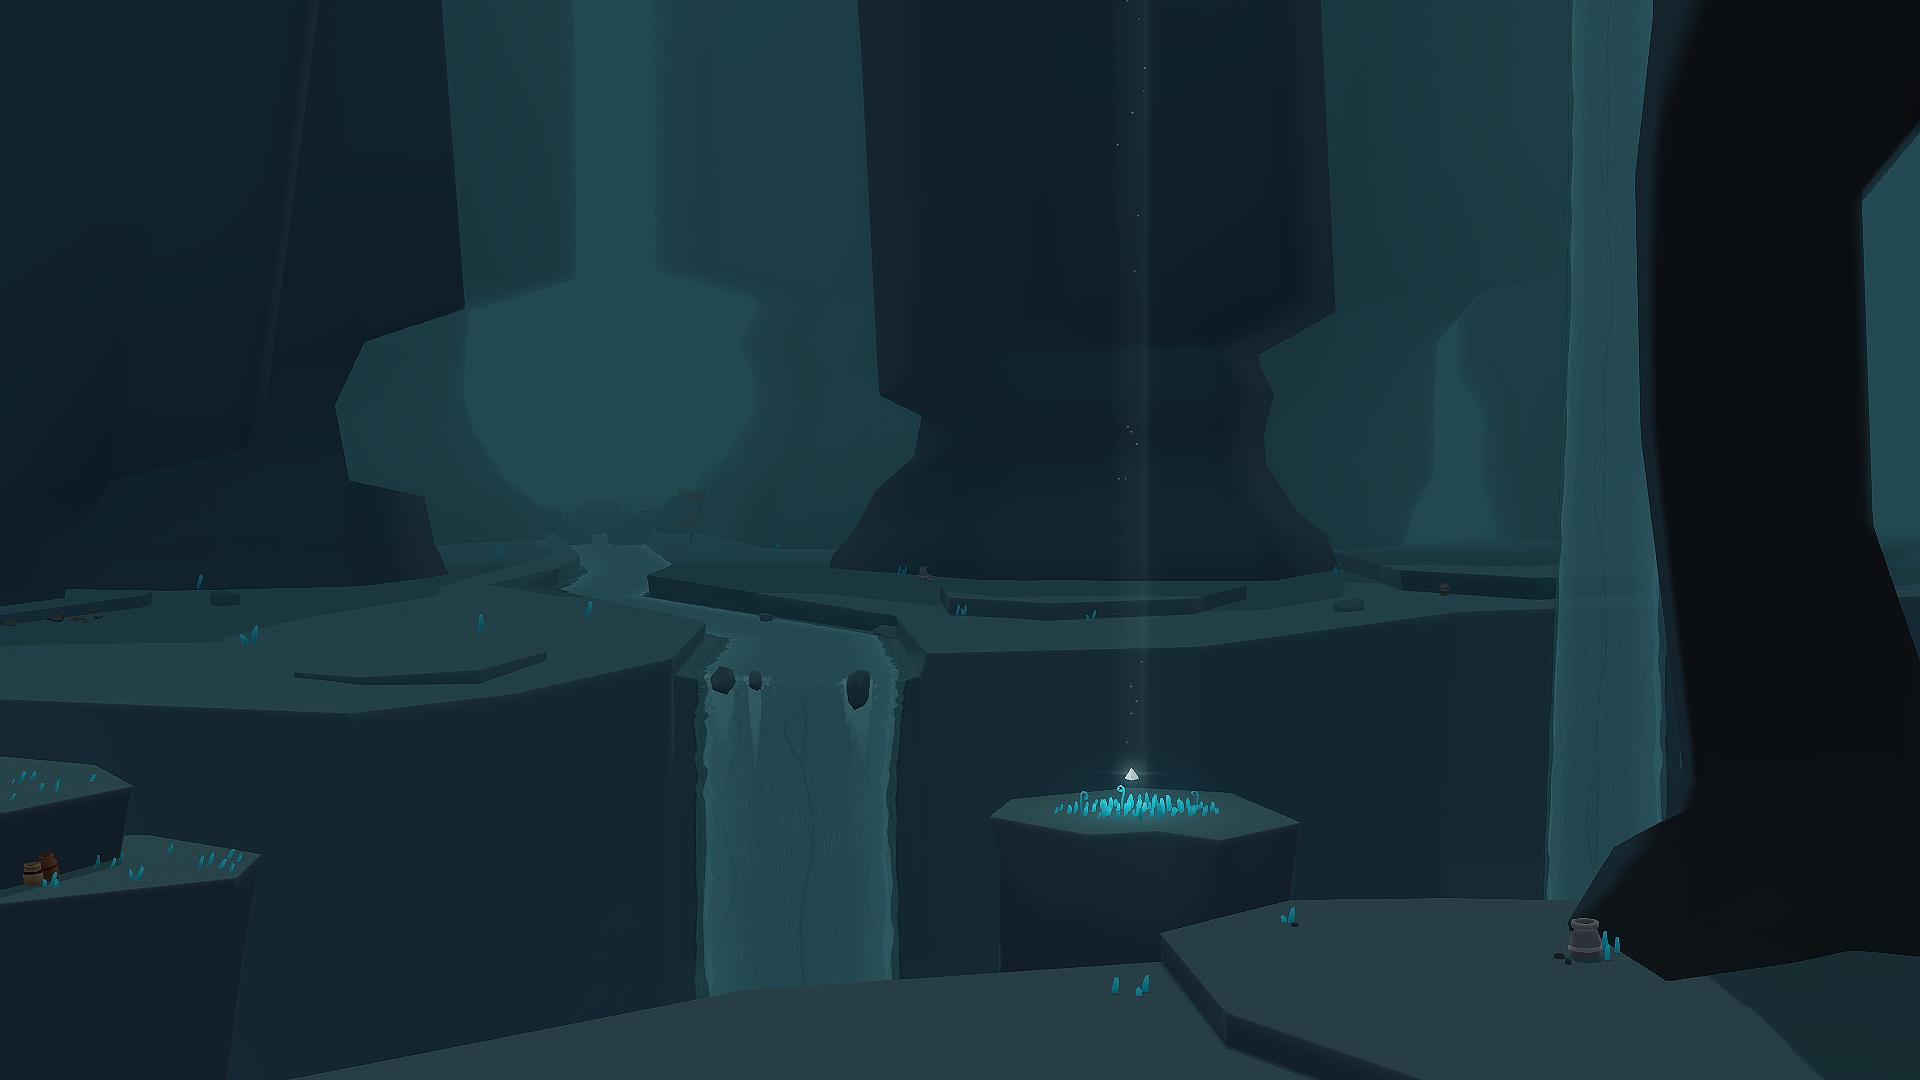 Distant screenshot 001